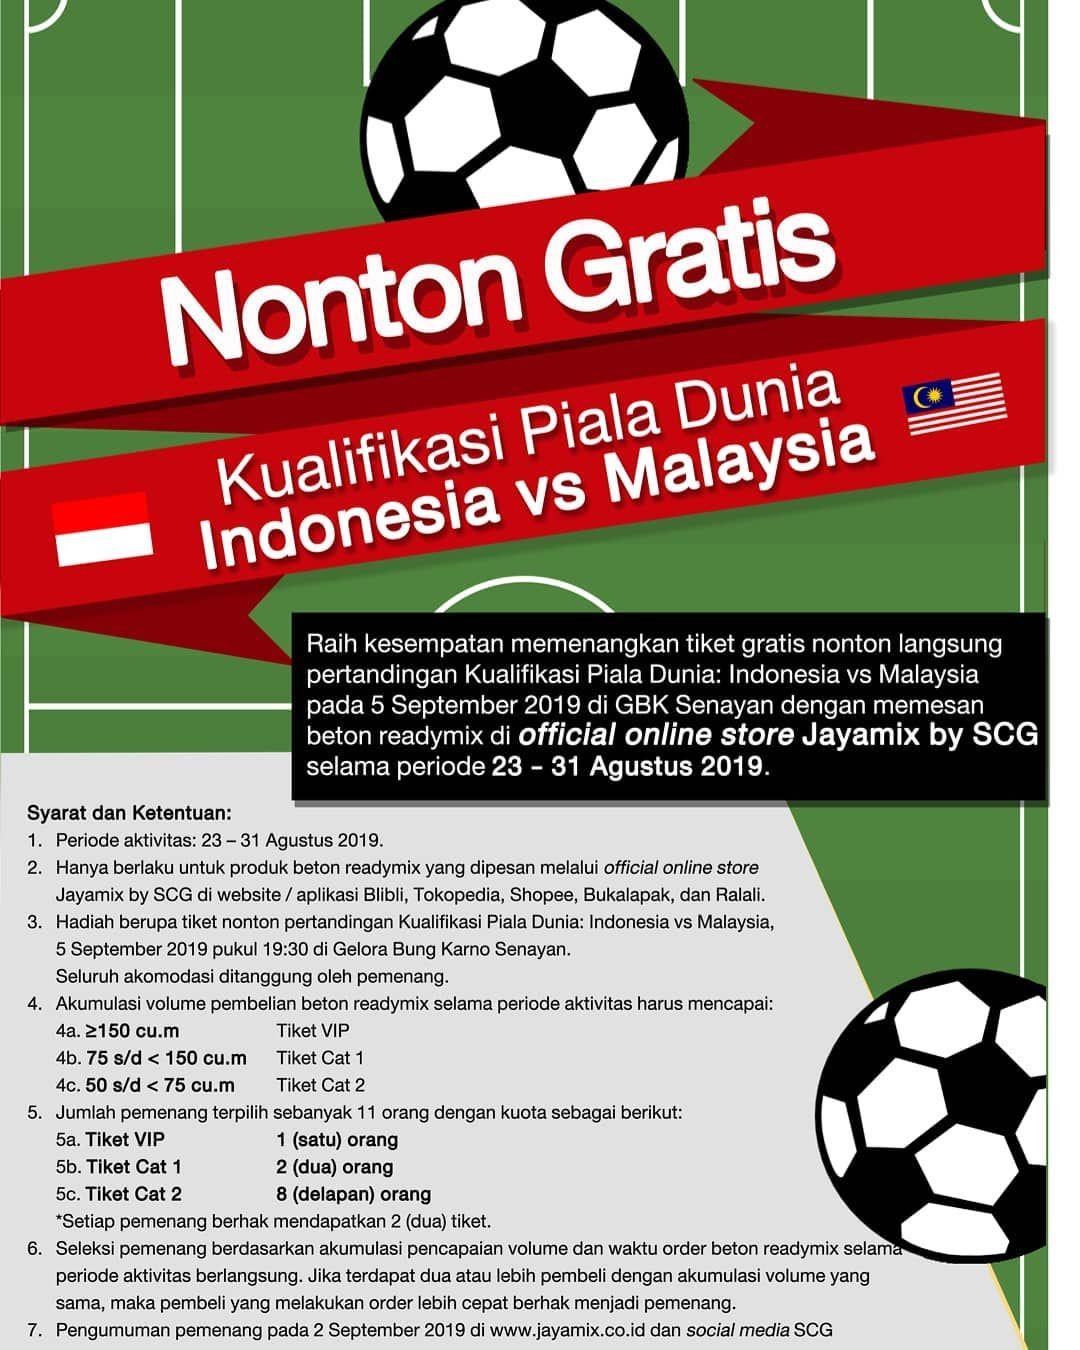 Nonton Gratis Kualifikasi Piala Dunia Indonesia Vs Malaysia Nobarjayamixscg Worldcup Worldcupqua Nonton Gratis Kualifikasi Piala Dunia Indonesia Vs Malays